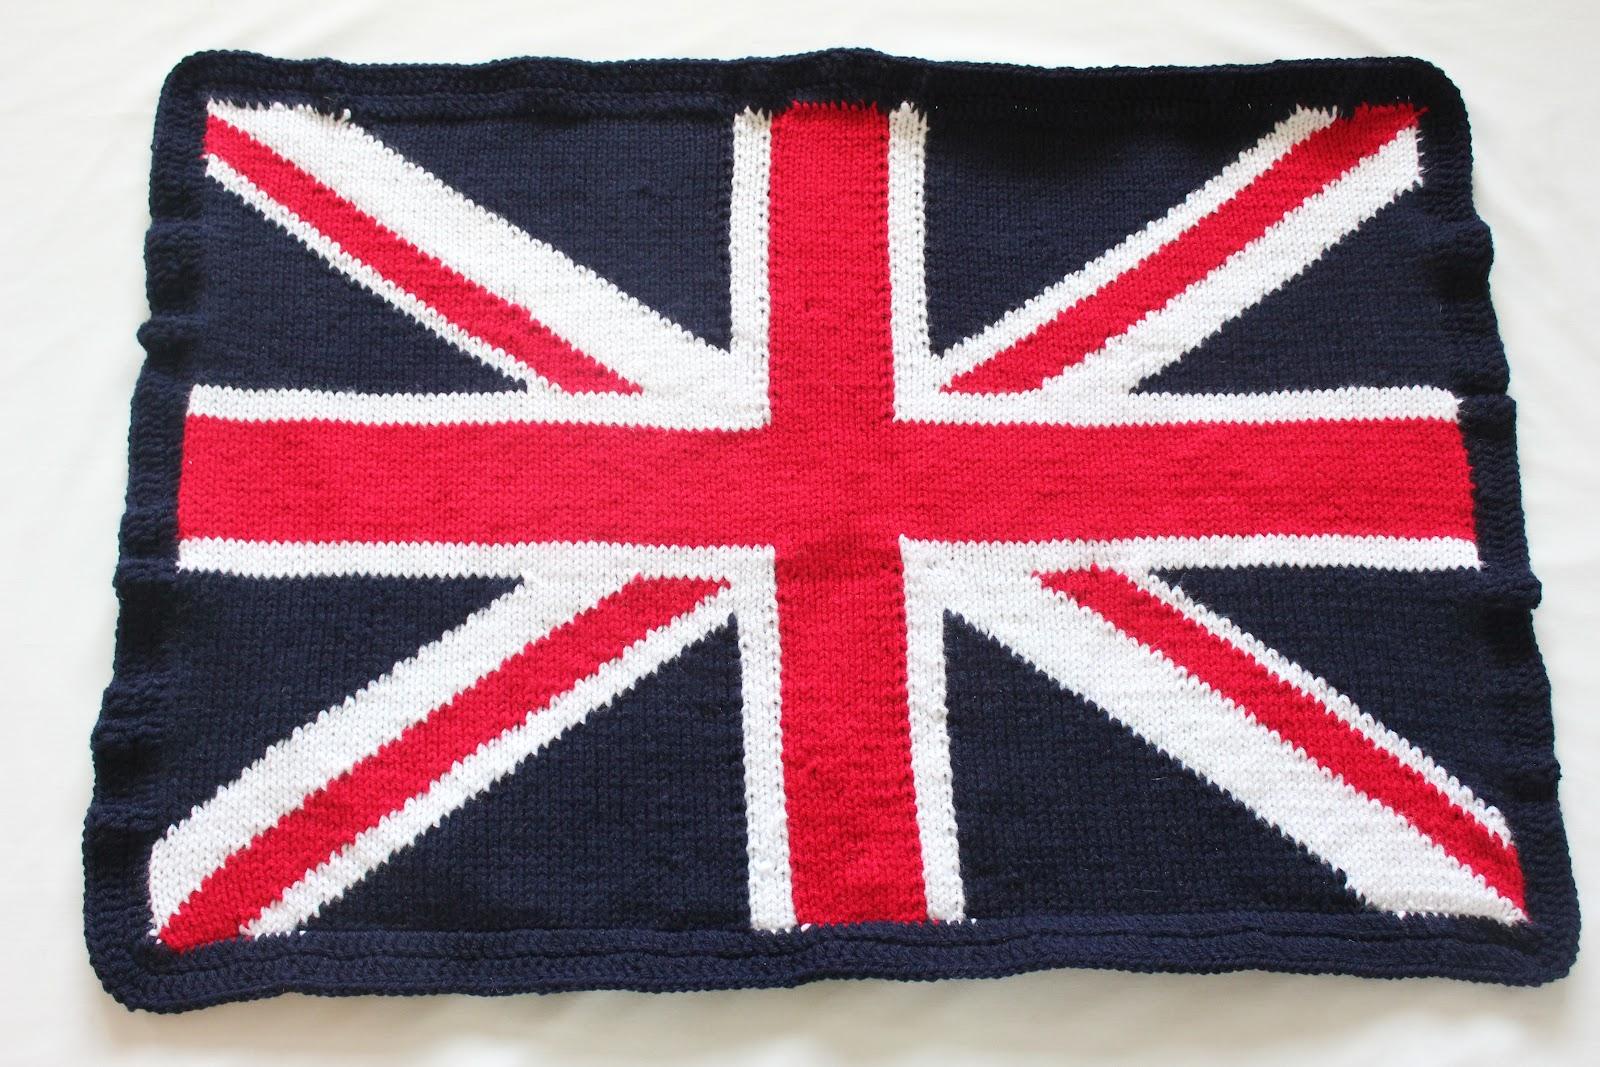 Knitting Pattern For Union Jack Blanket : WoollyBudgie